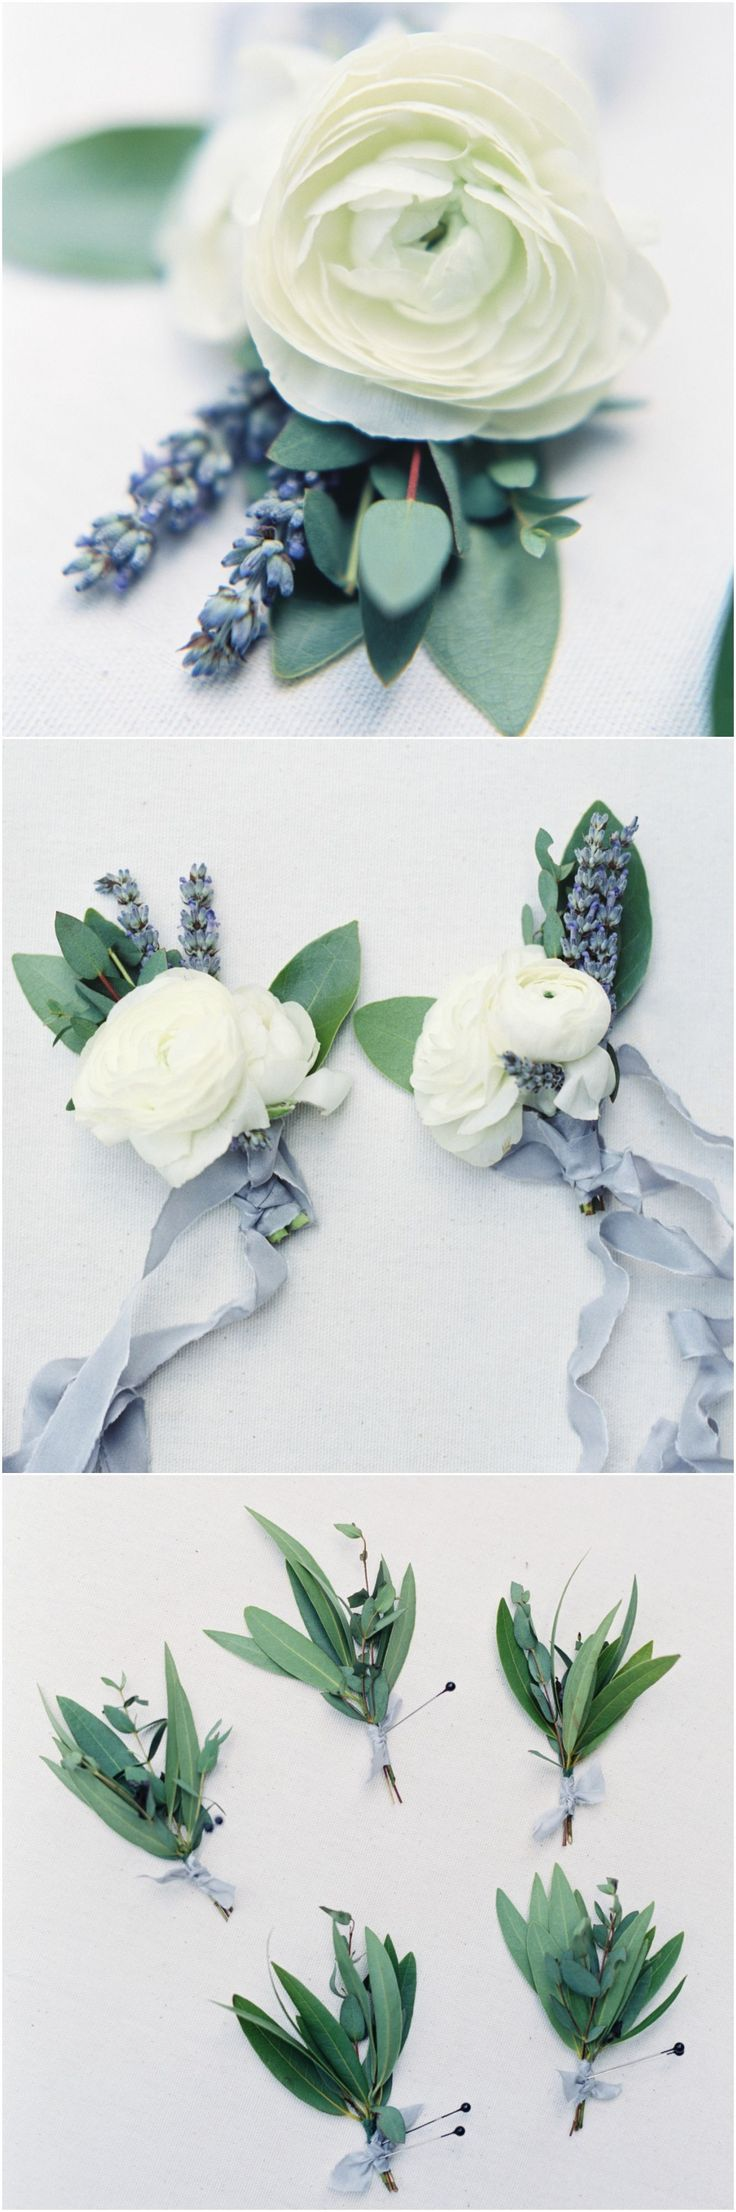 Wedding boutonnieres, lavender sprigs, white ranunculus, spring wedding flowers // Jenna McElroy Photography #whiteranunculus #ranunculuswedding